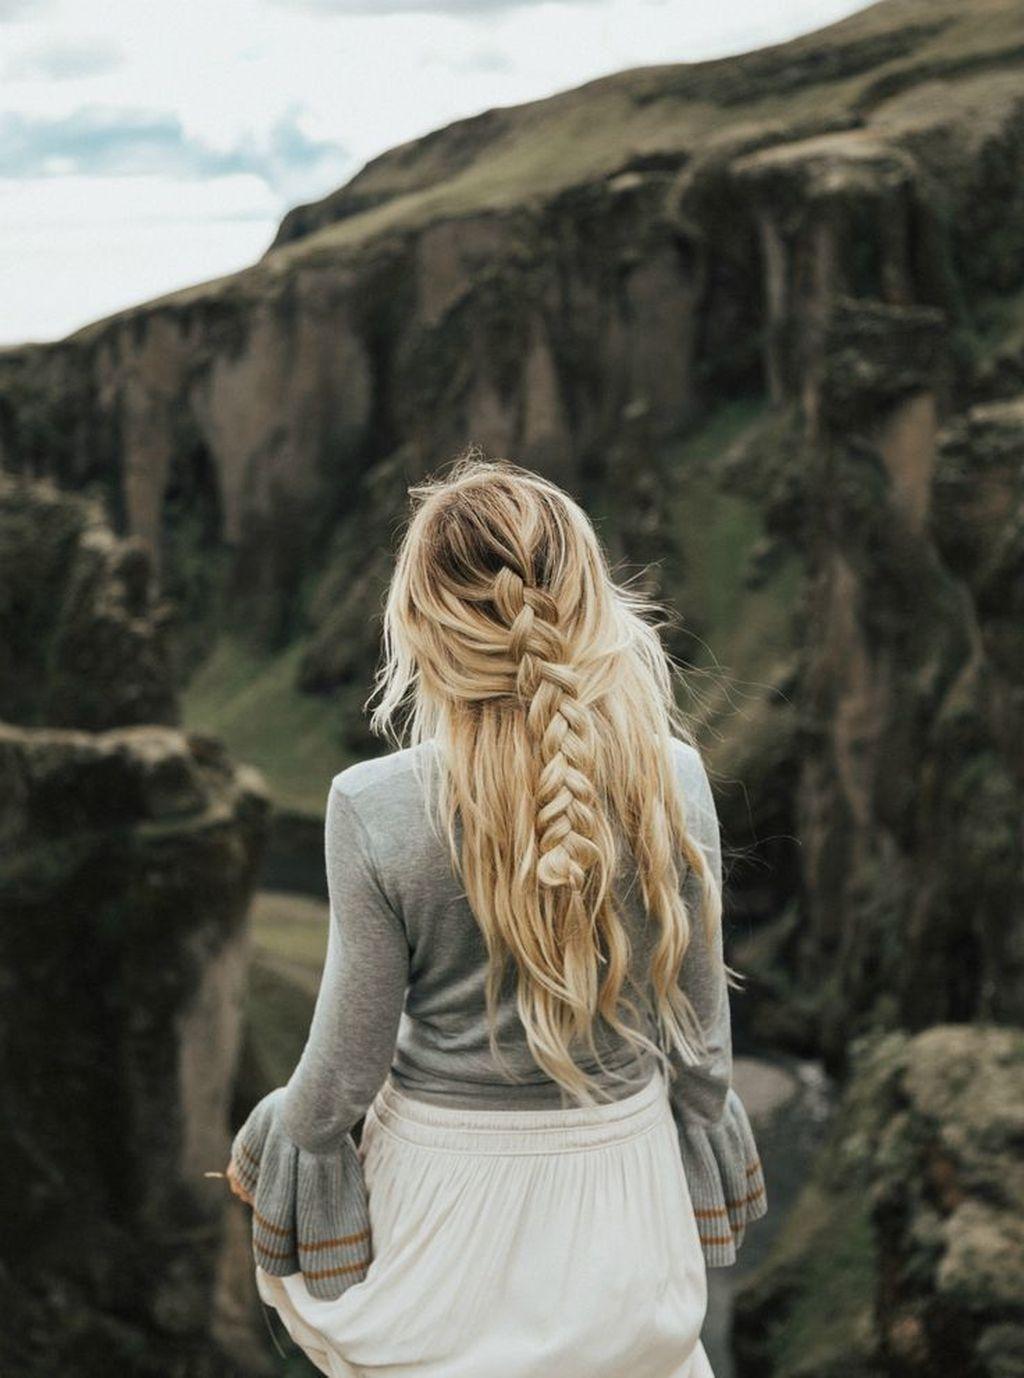 Lovely Blonde Hairstyles Ideas 2018 Women – Fashionre